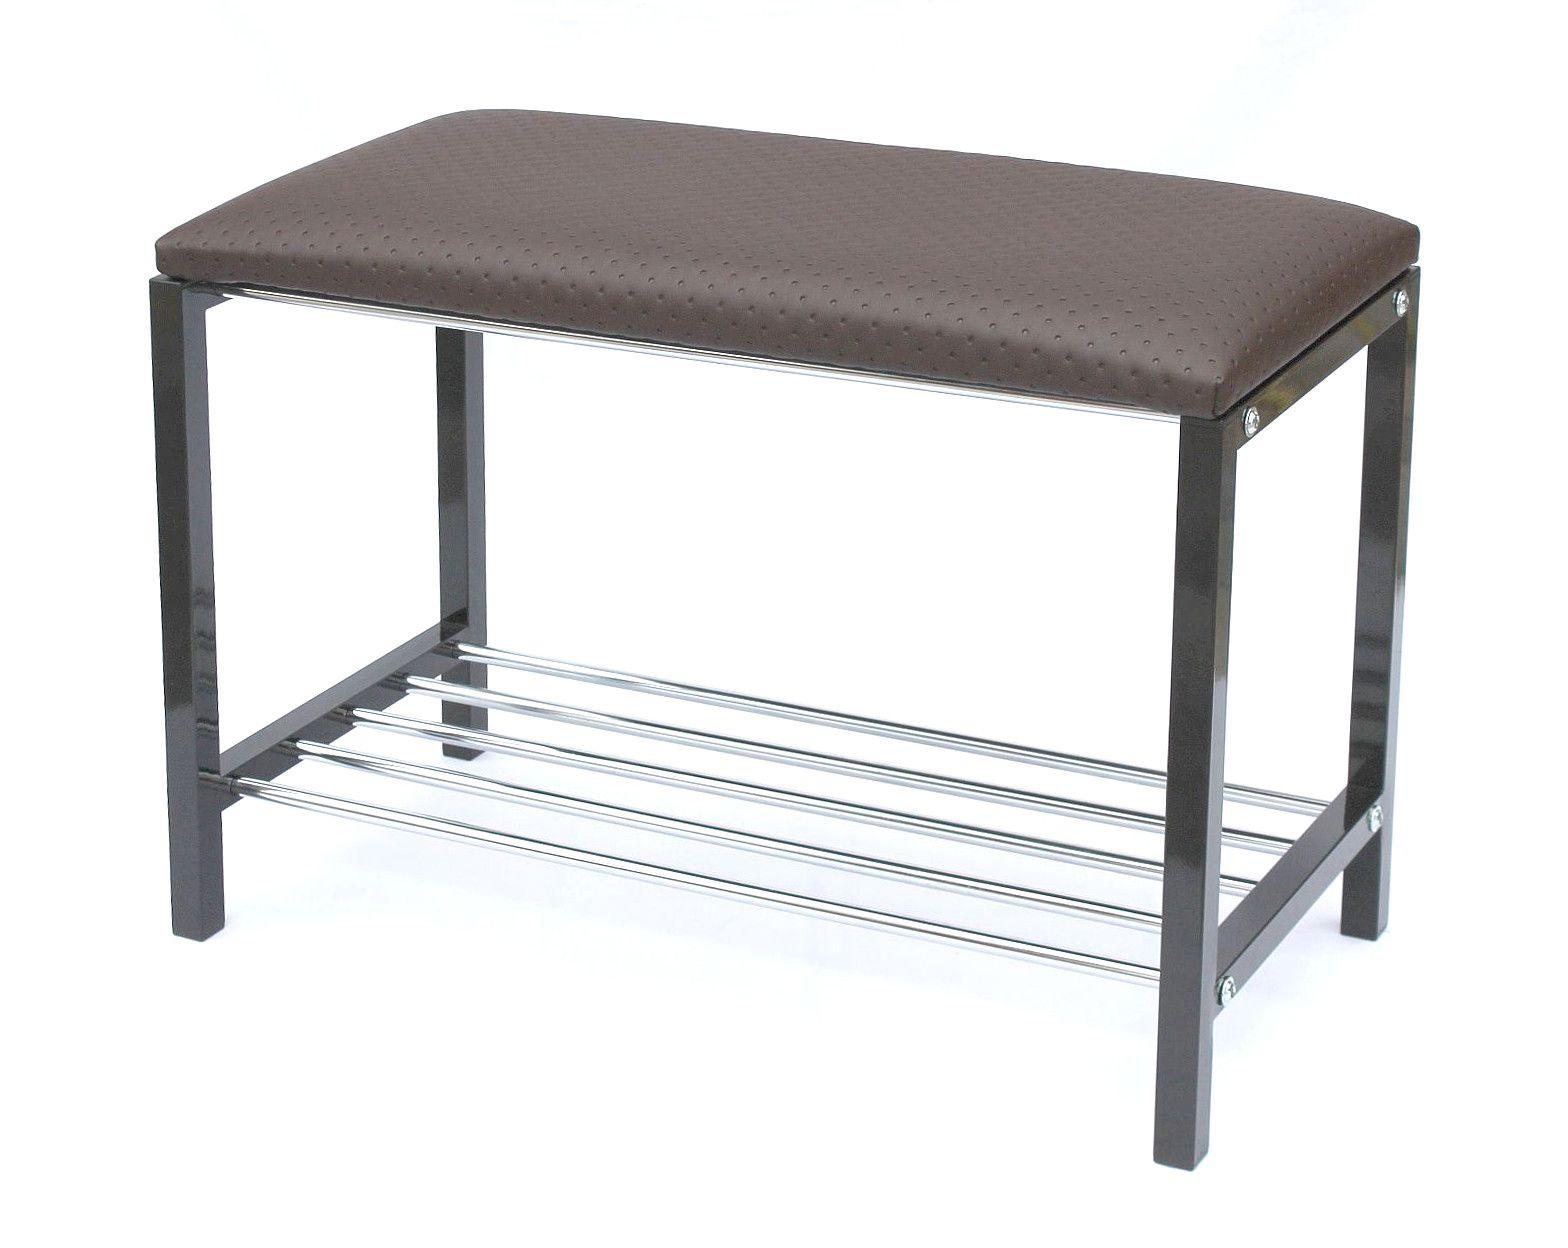 Schuhregal mit Sitzbank Art.391 Bank 70 cm Schuhschrank aus Metall ...